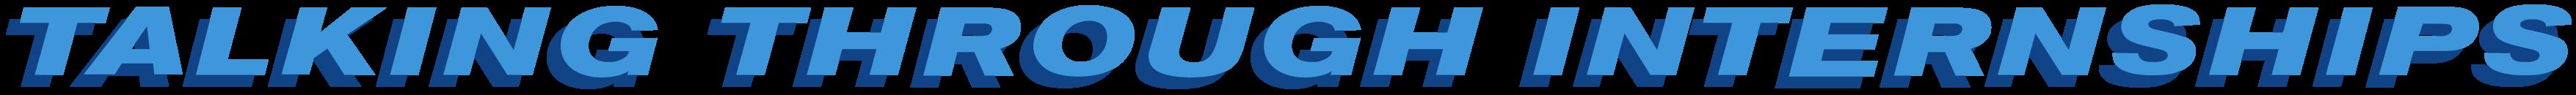 TTI logo